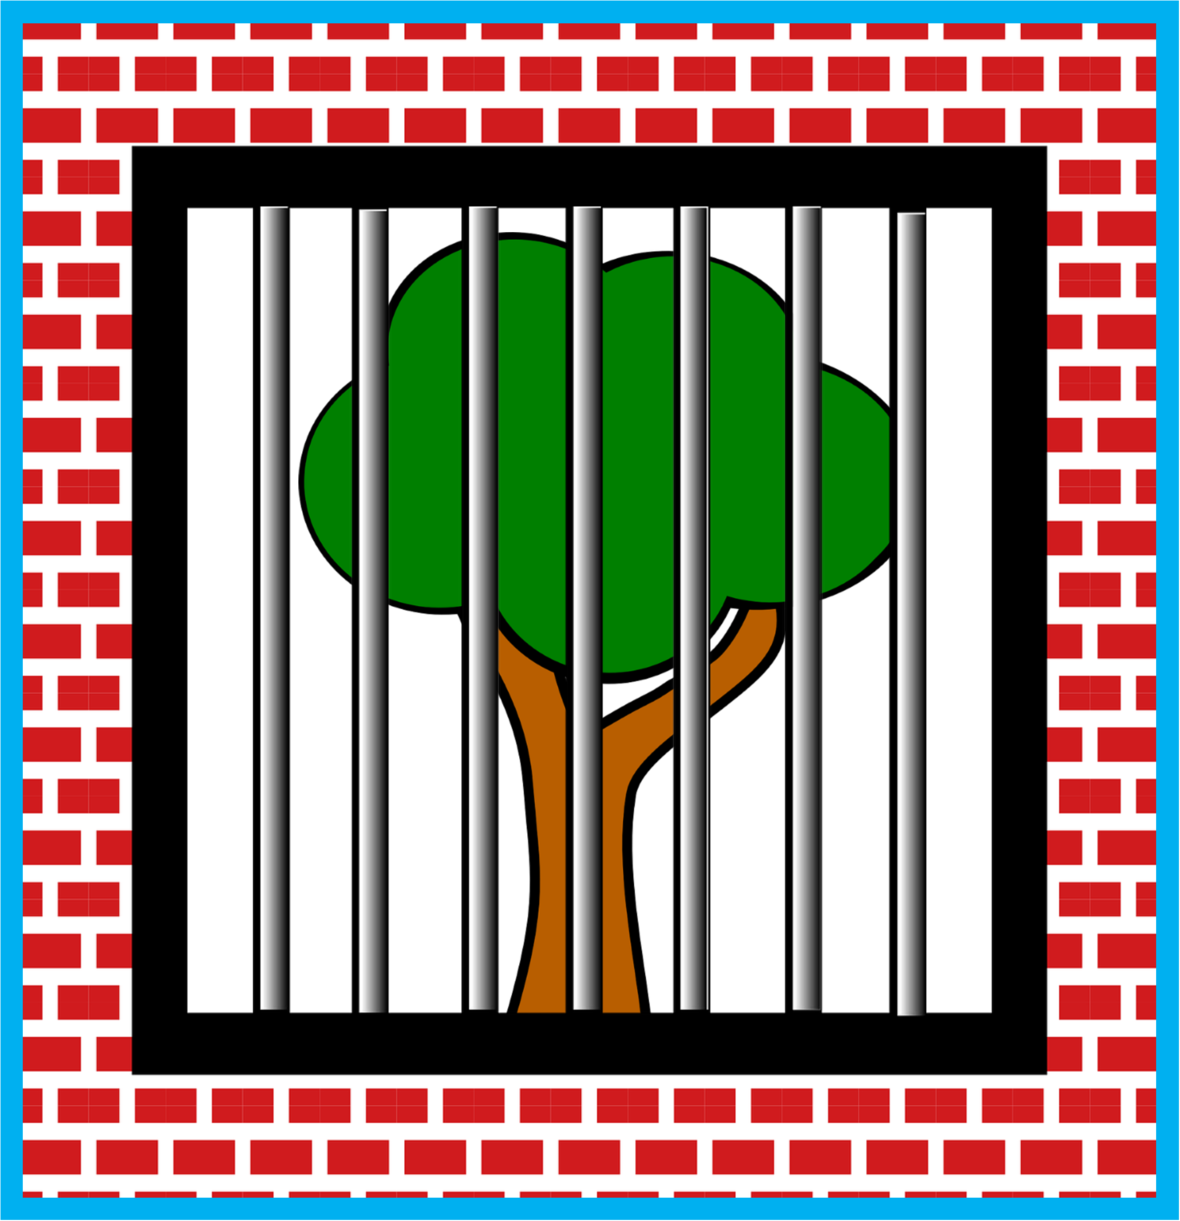 Green Tree Chopped Image